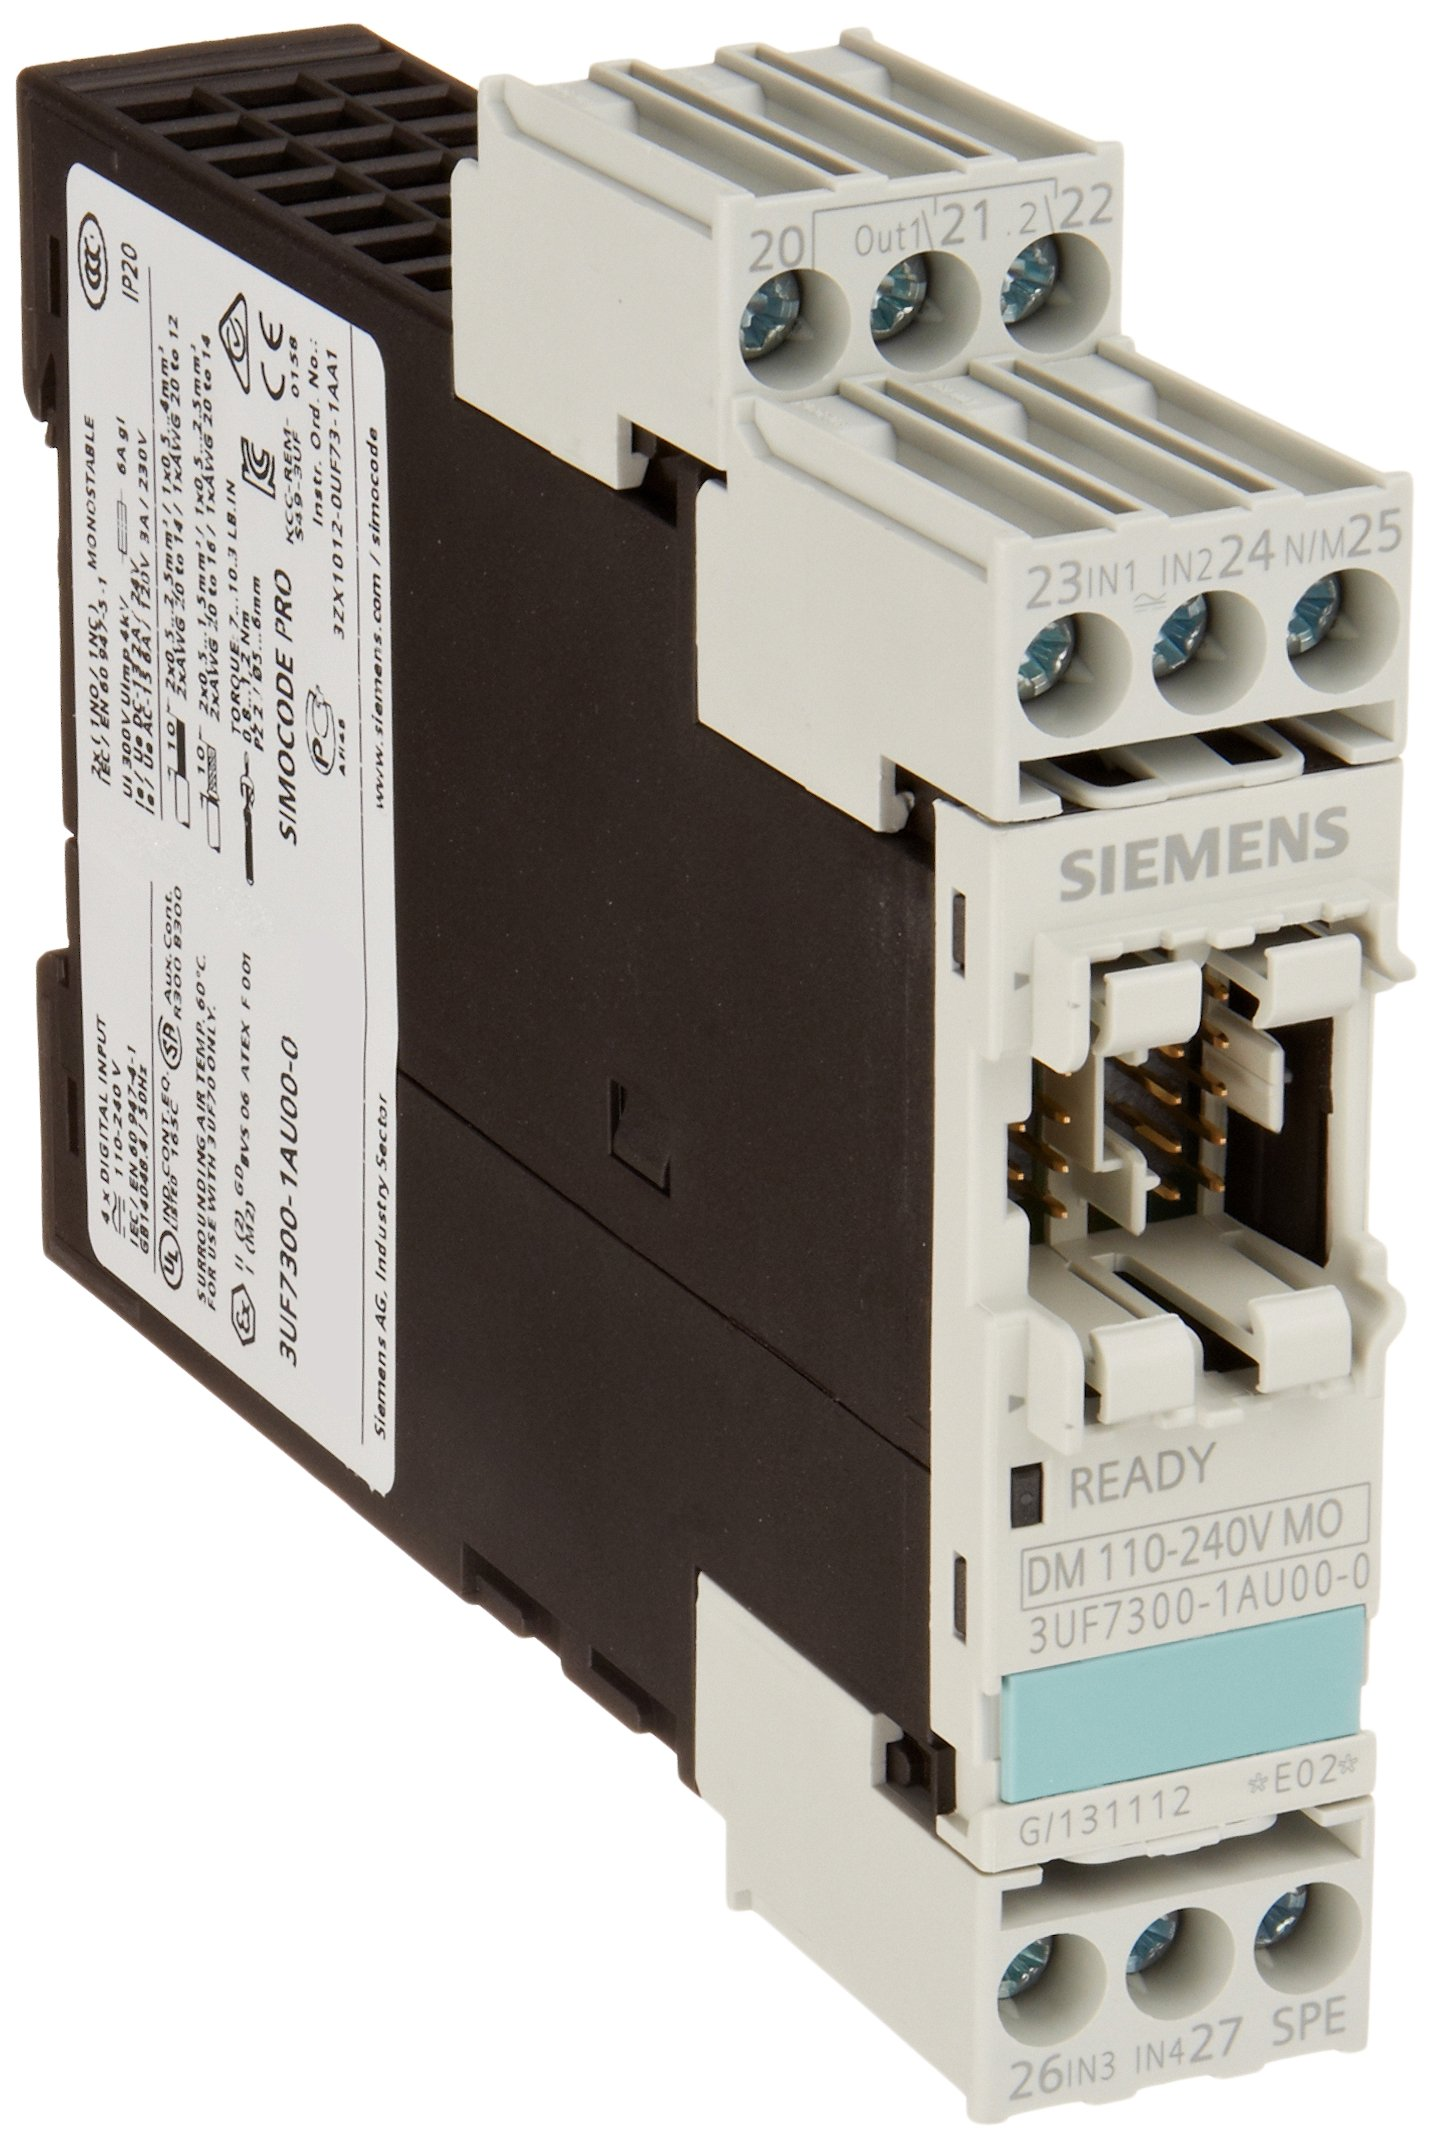 Siemens 3UF7 300-1AU00-0 SIMOCODE Digital Module Relay Output, Monostable, 110-240VAC/DC Input Voltage